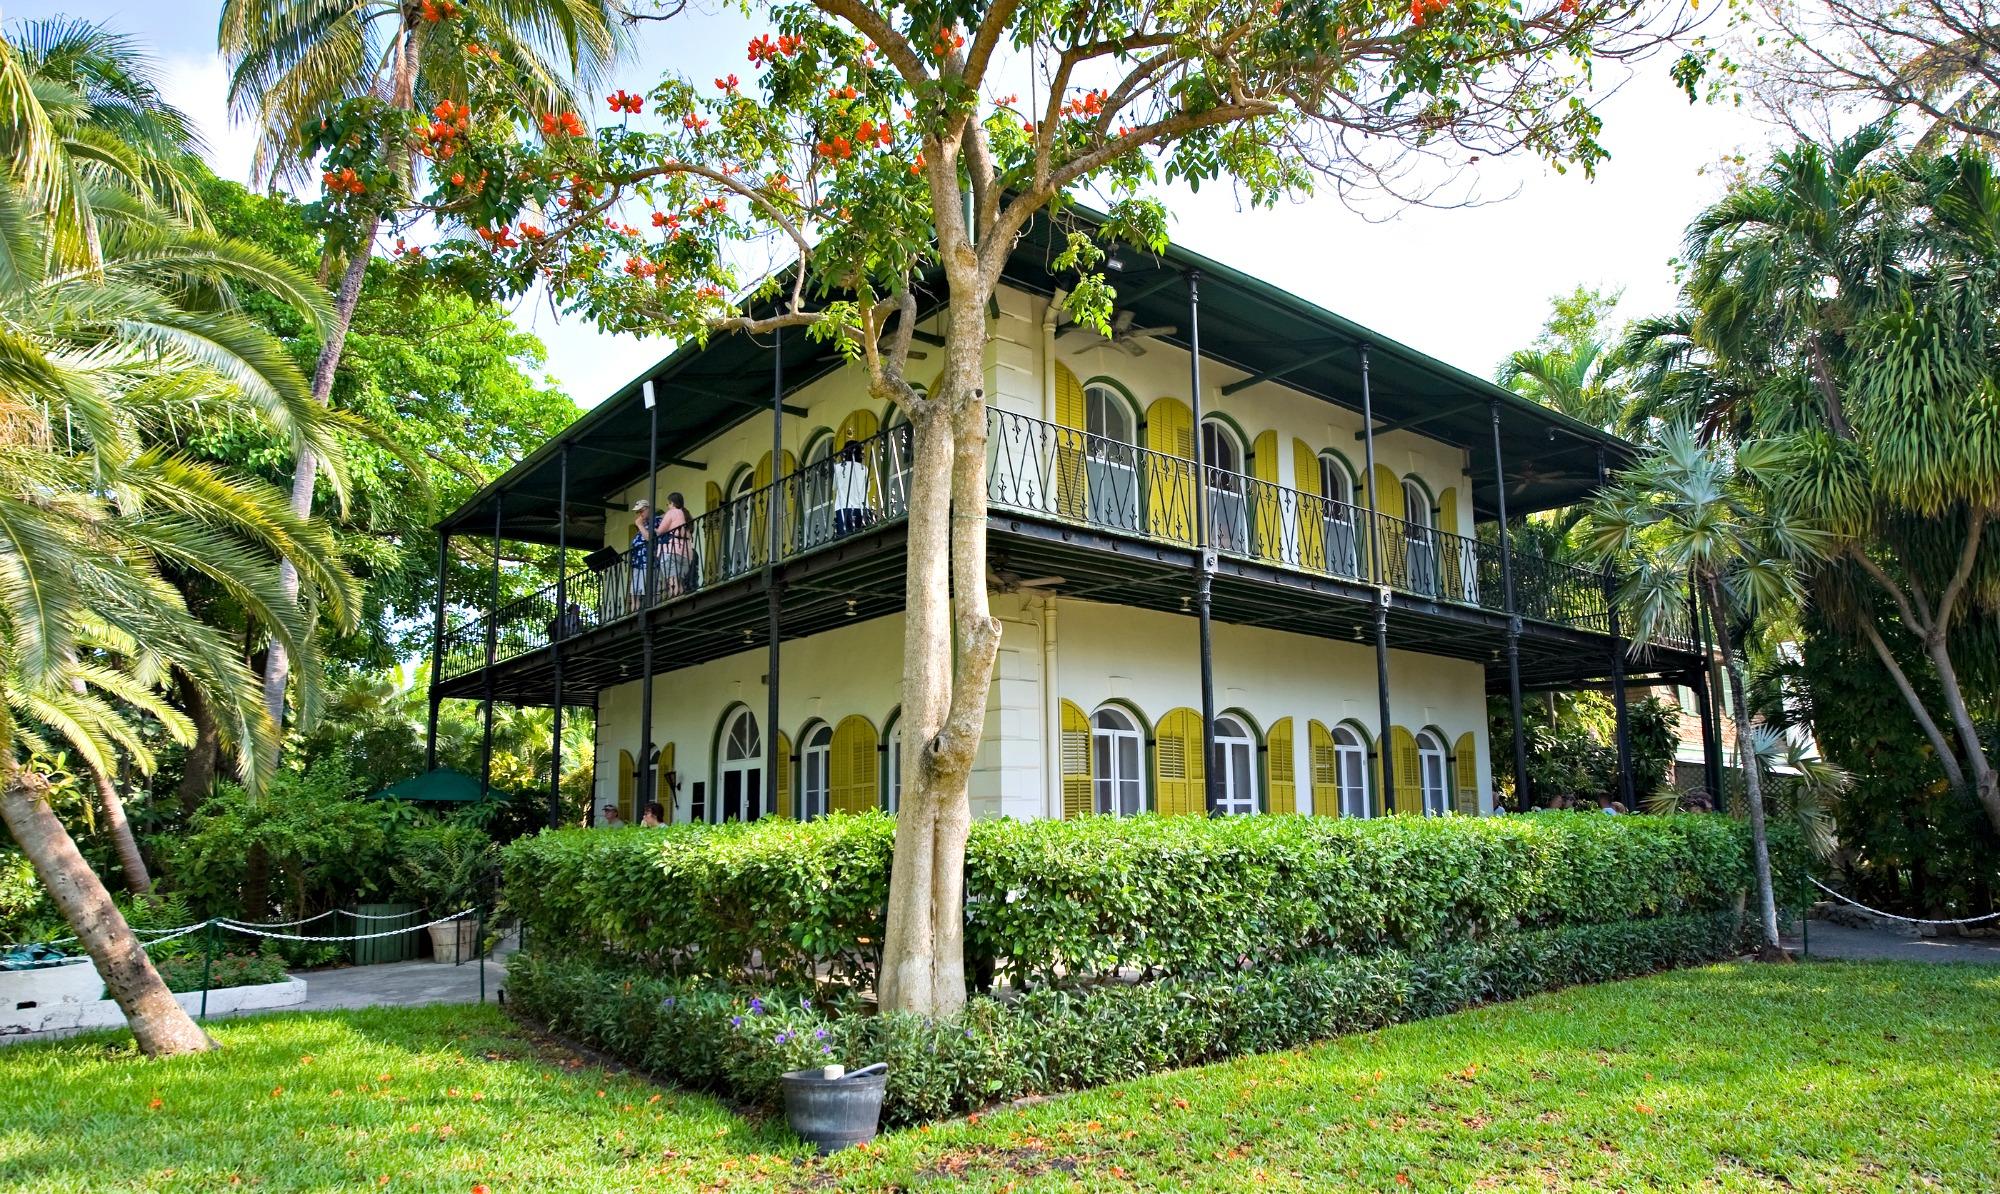 Ernest Hemingway's house in Key West